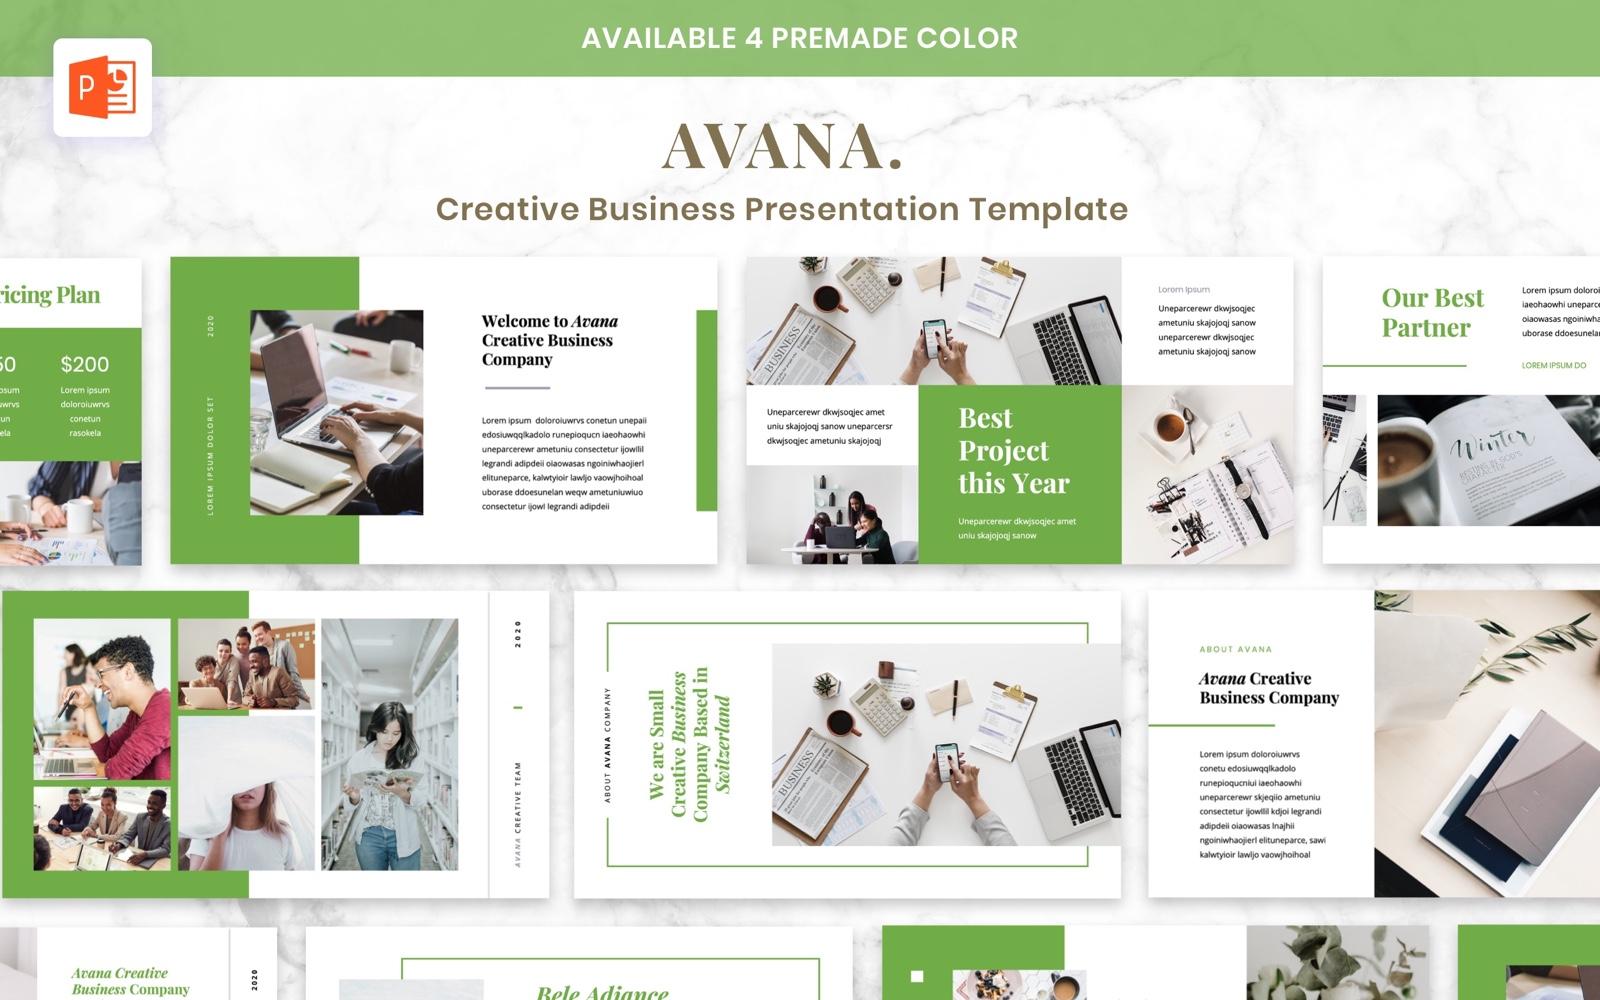 Avana - Creative Business Template PowerPoint №102879